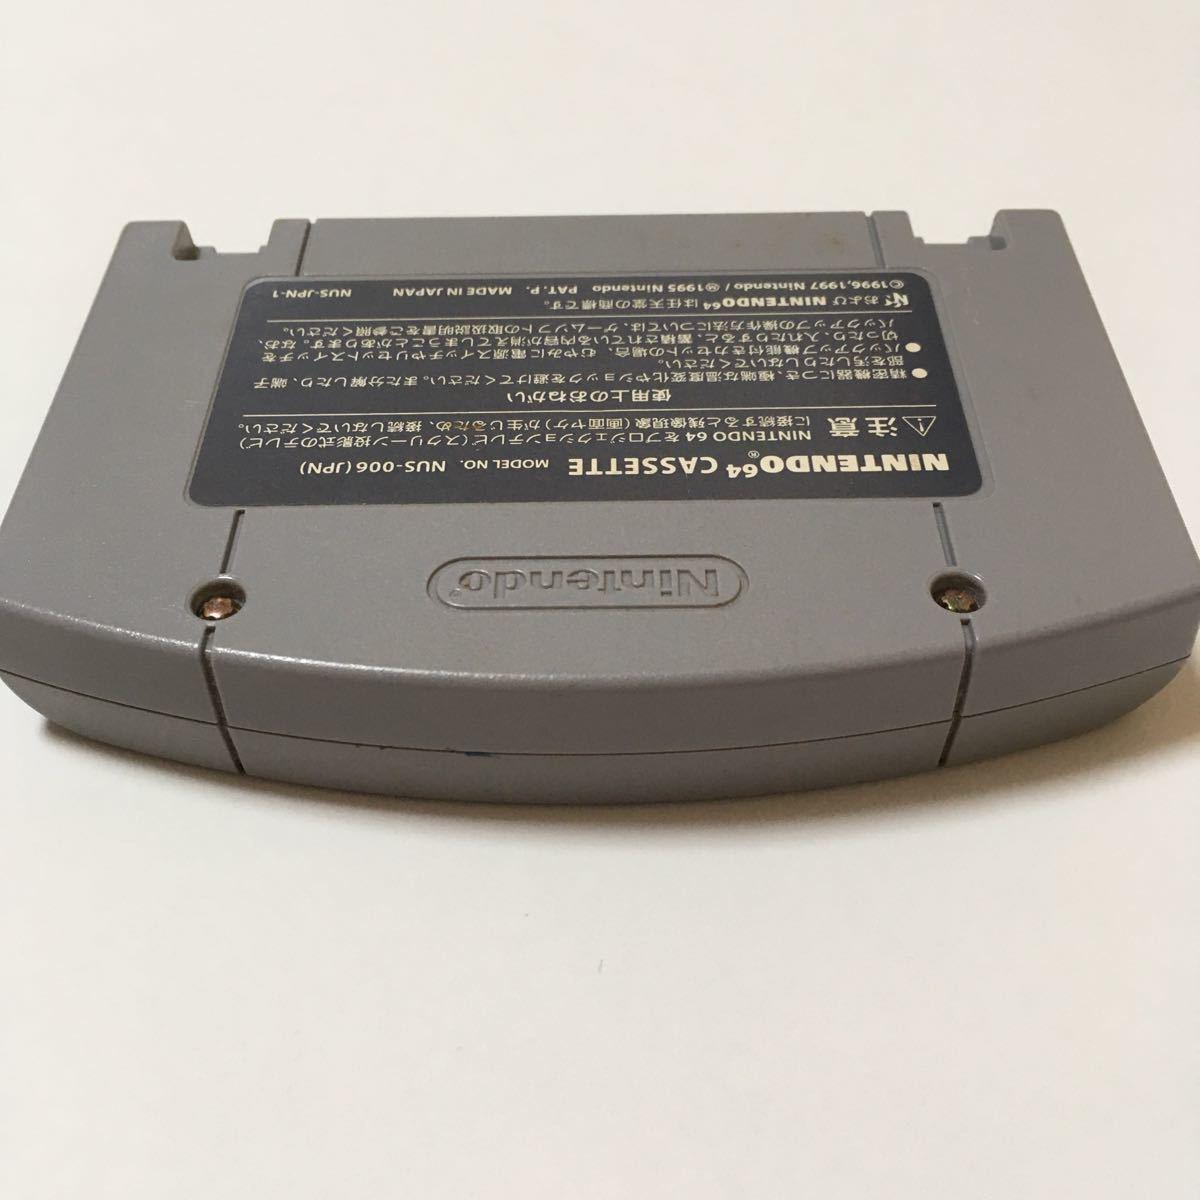 NINTENDO64 ソフト 電車でGO 動作確認済み カセット ゲーム レトロ 駅 電車 乗り物 新幹線 任天堂 ニンテンドー